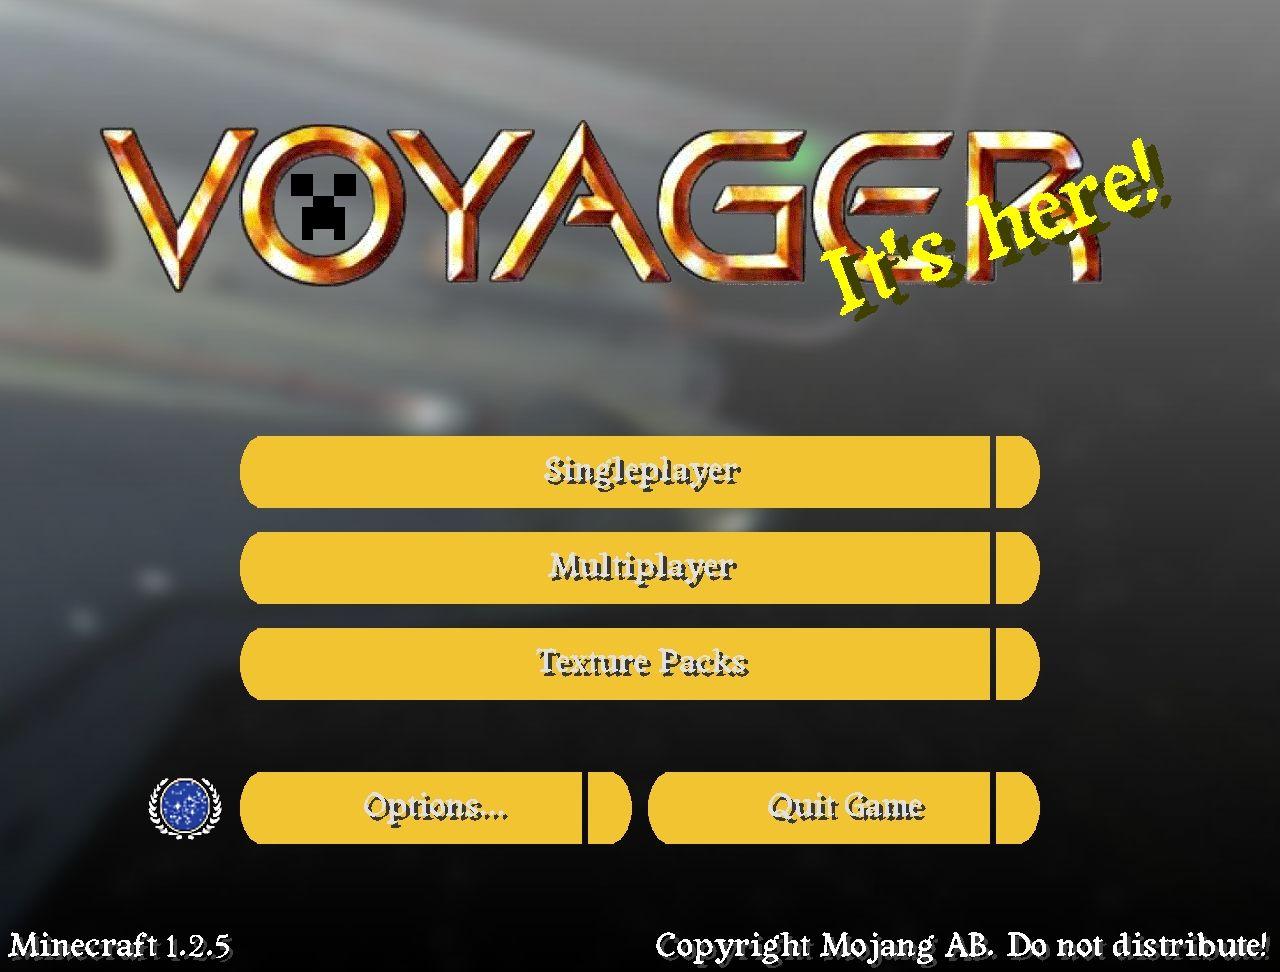 Chrisryot 39 s hd star trek resource pack 1 8 1 minecraft for Star trek online crafting leveling guide